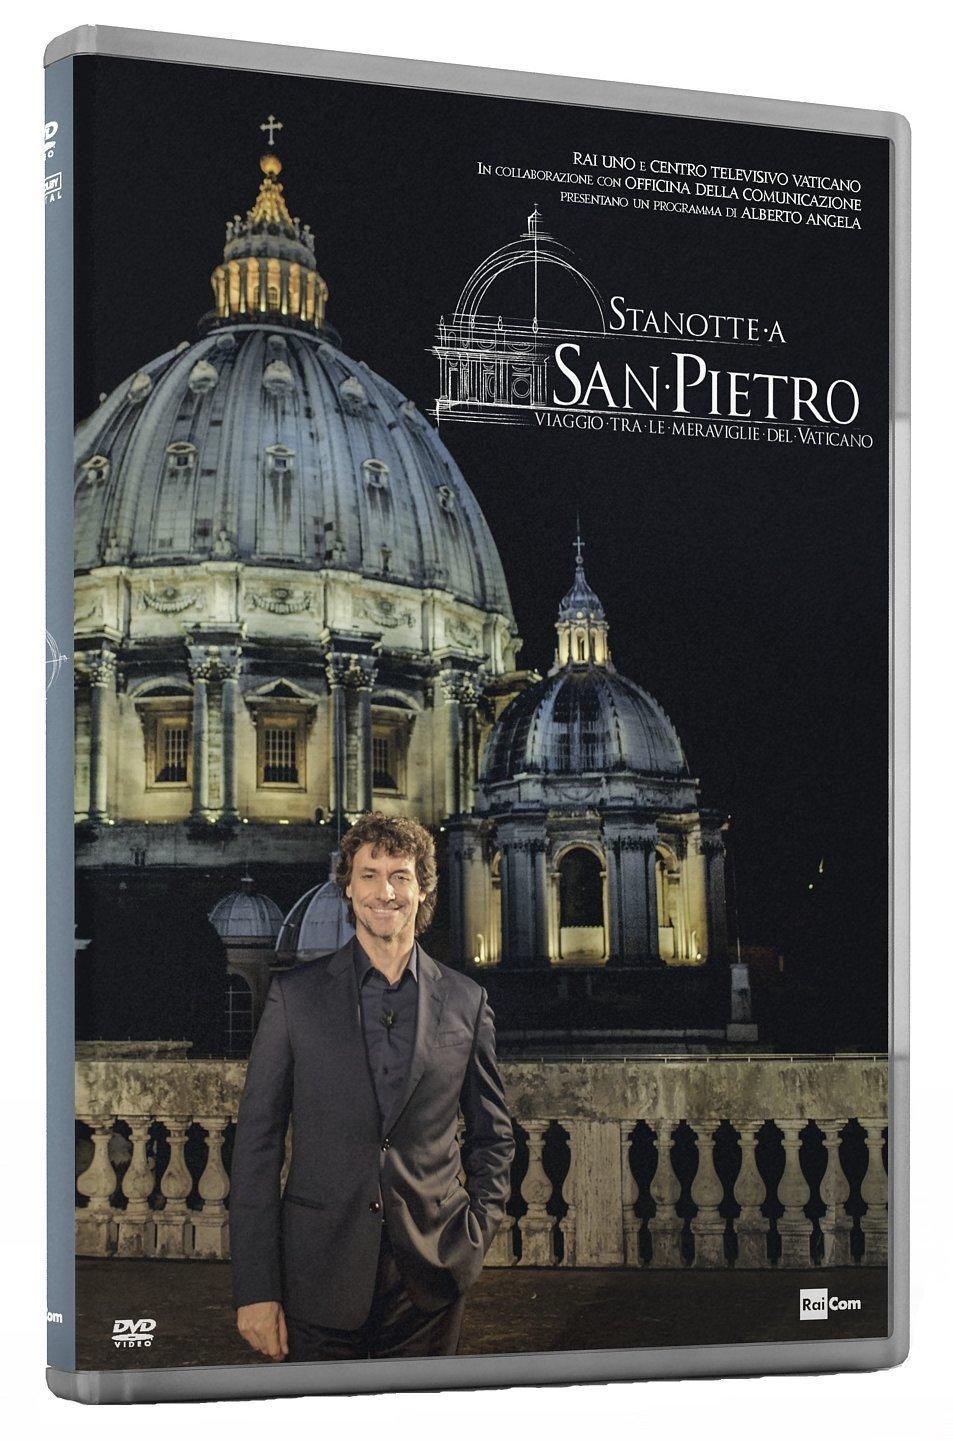 STANOTTE A SAN PIETRO (DVD)